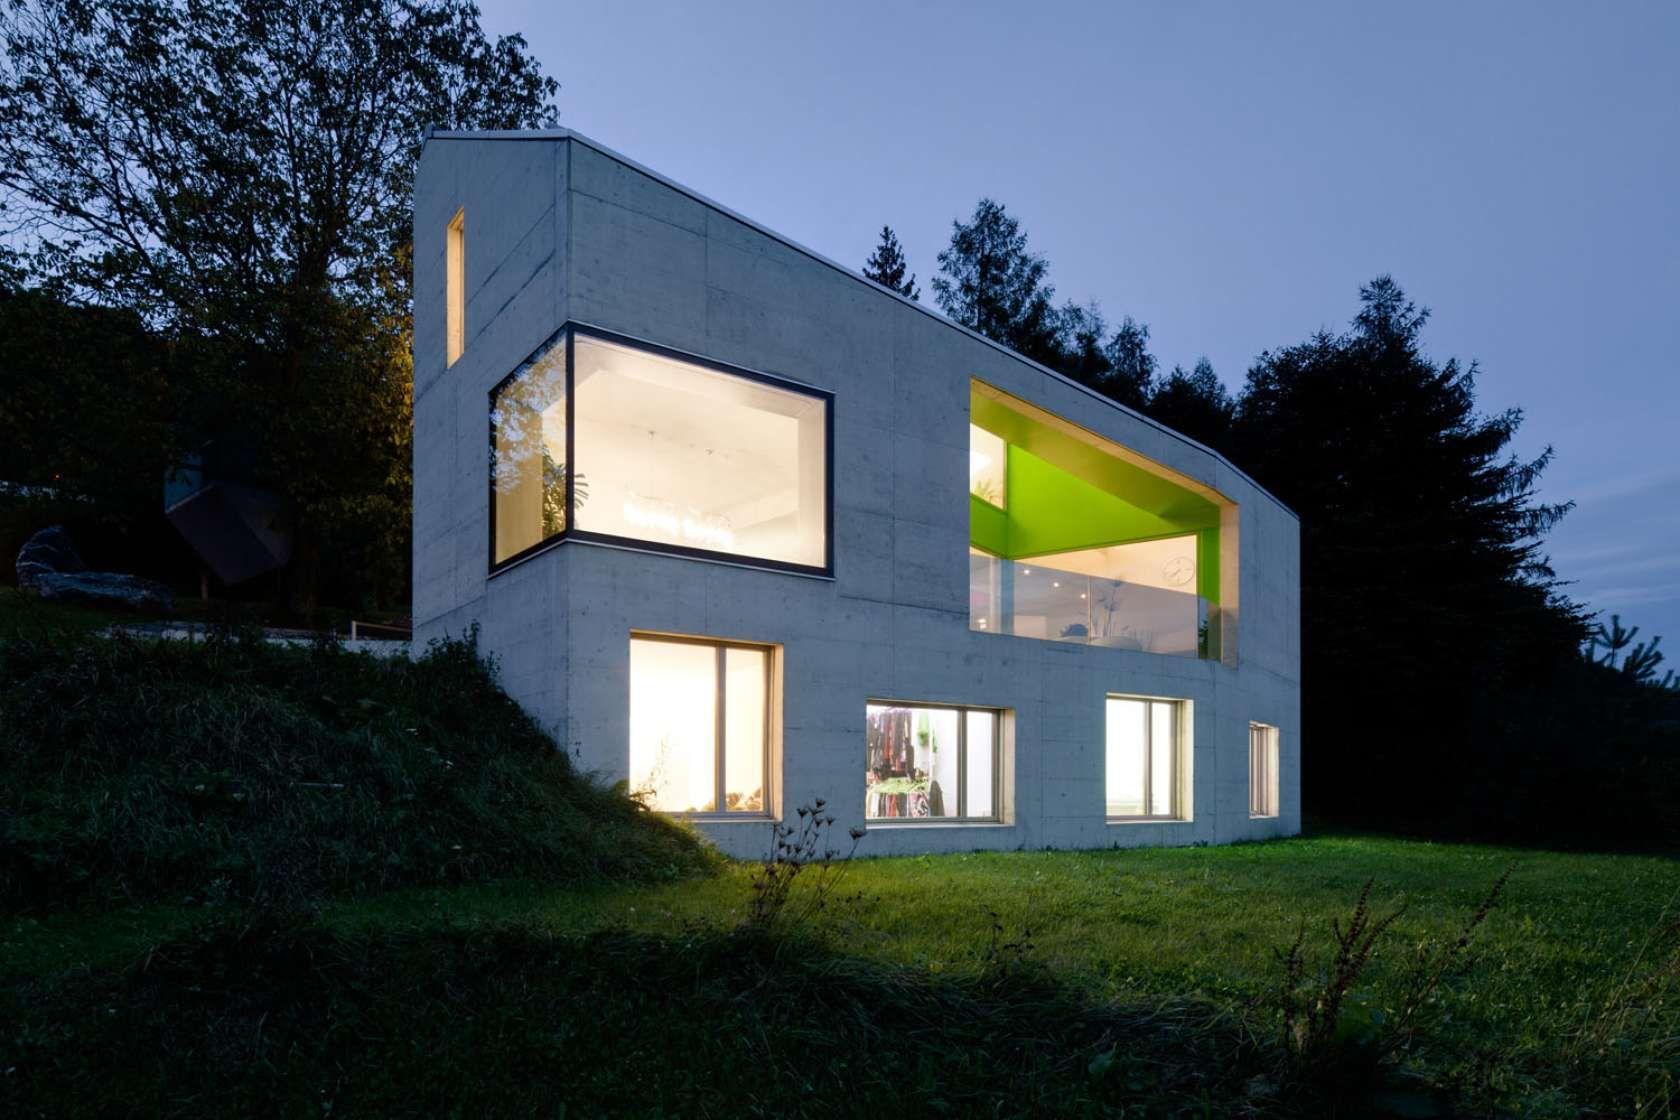 Einfamilienhaus dättlikon zürich switzerland moos giuliani herrmann architekten